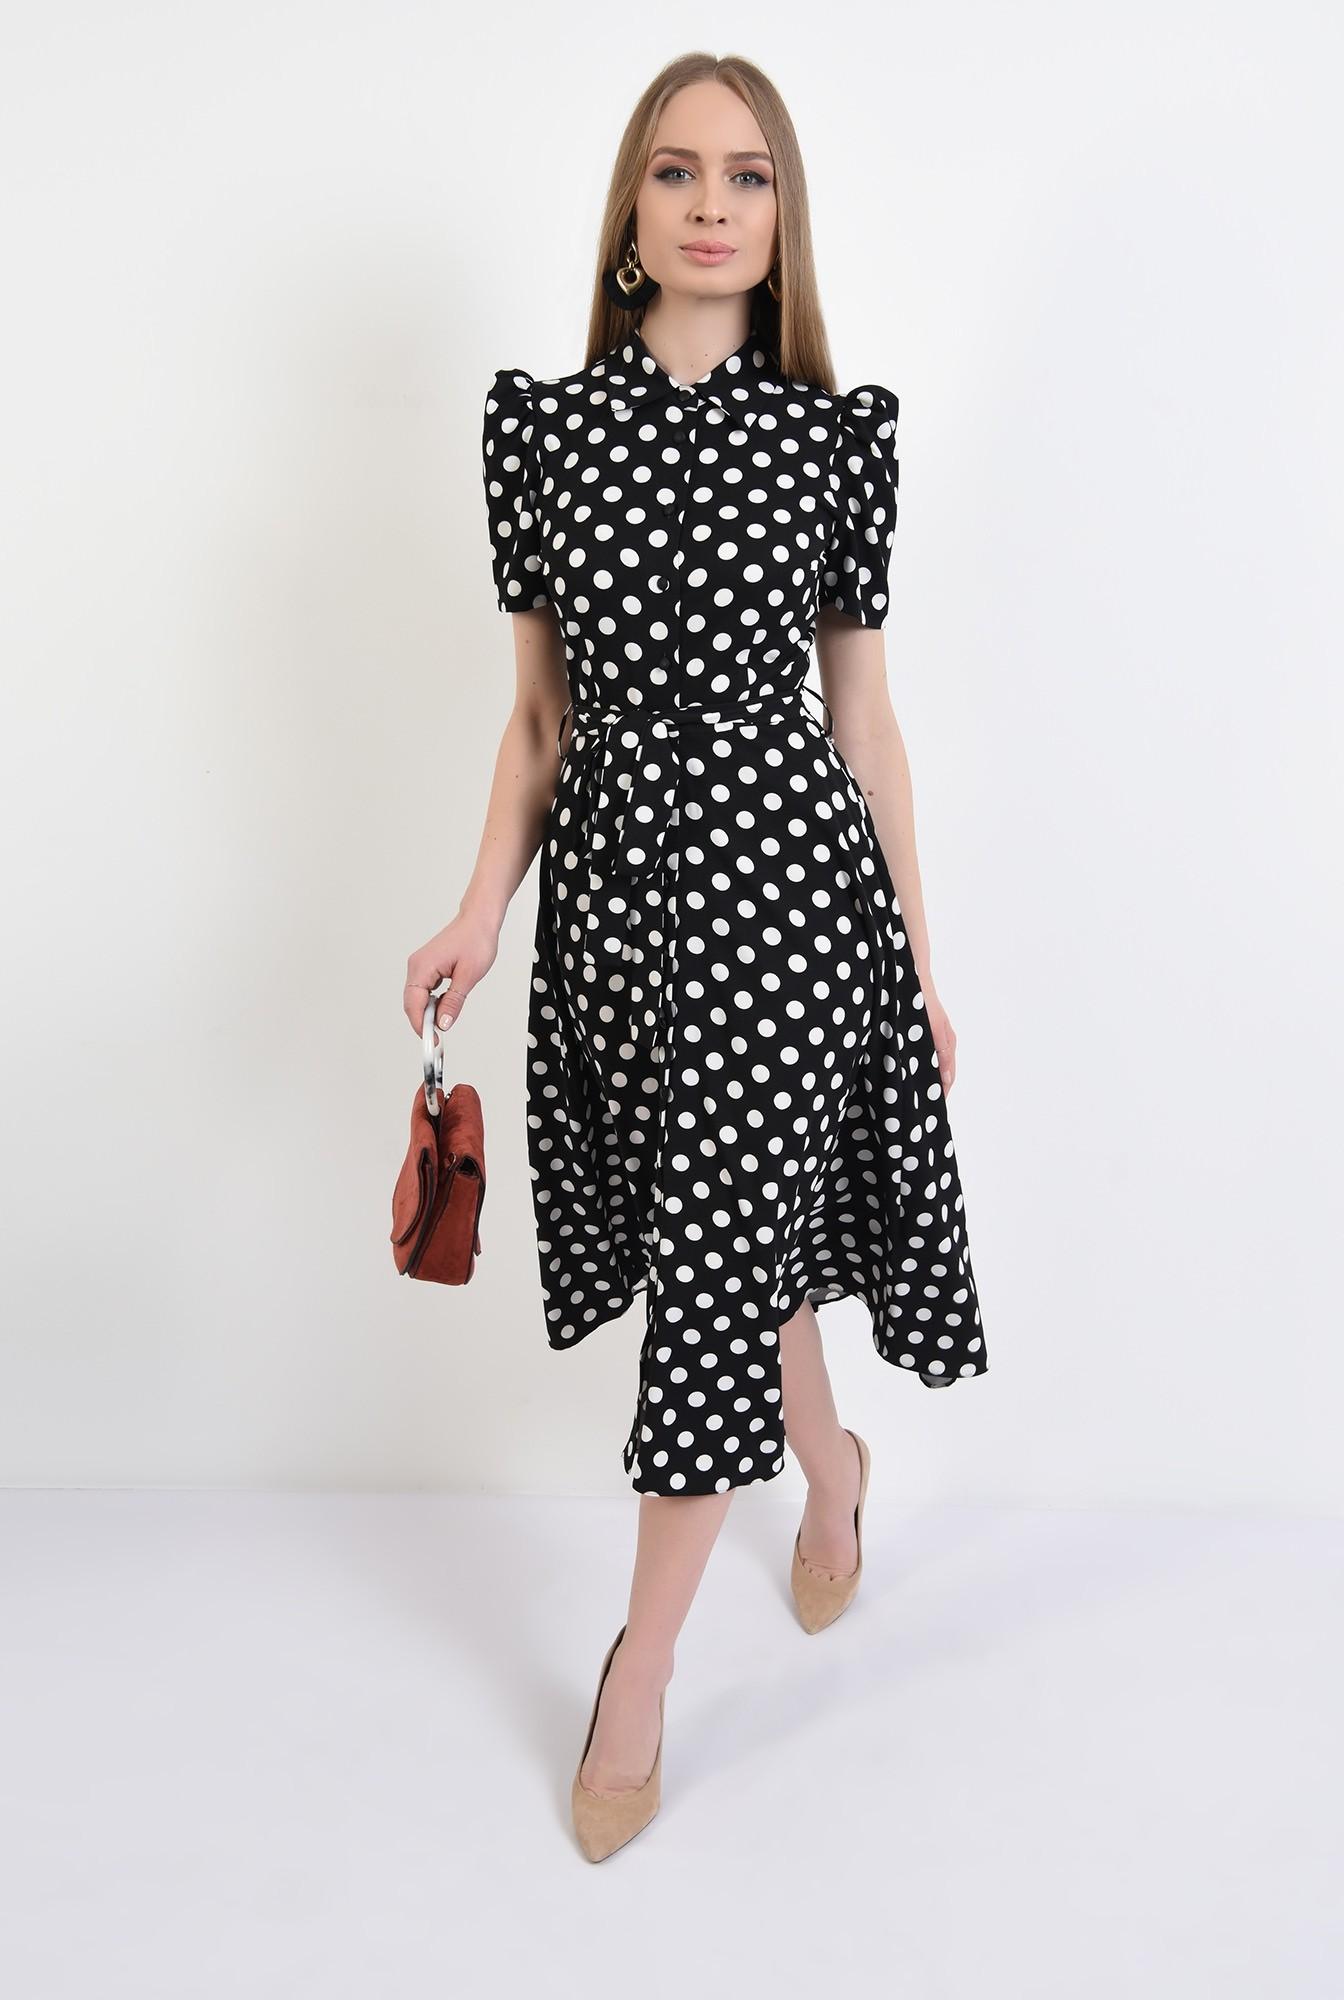 3 - rochie casual, evazata, cu nasturi, cu cordon, buline, Poema